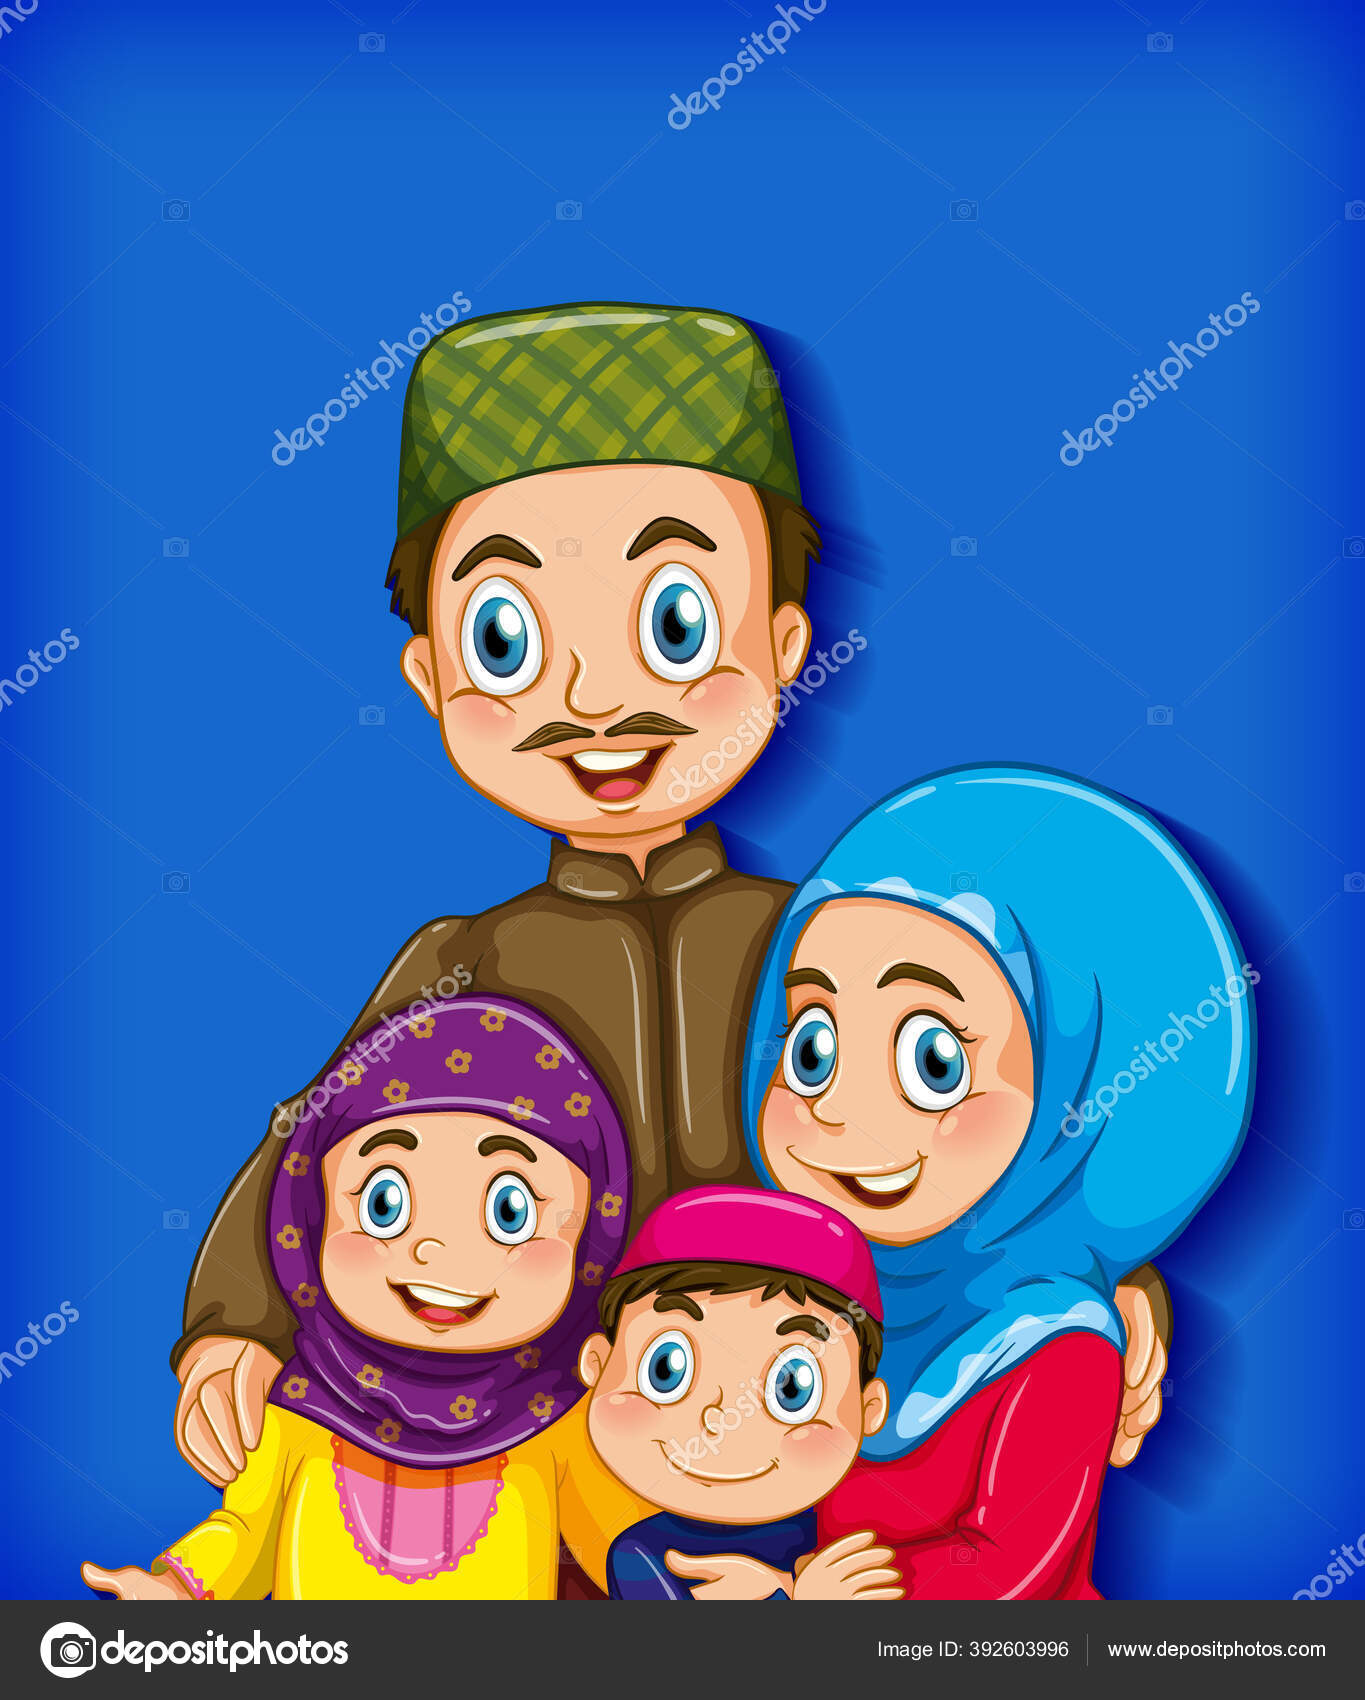 Anggota Keluarga Muslim Pada Kartun Karakter Warna Gradien Latar Belakang Stok Vektor C Interactimages 392603996